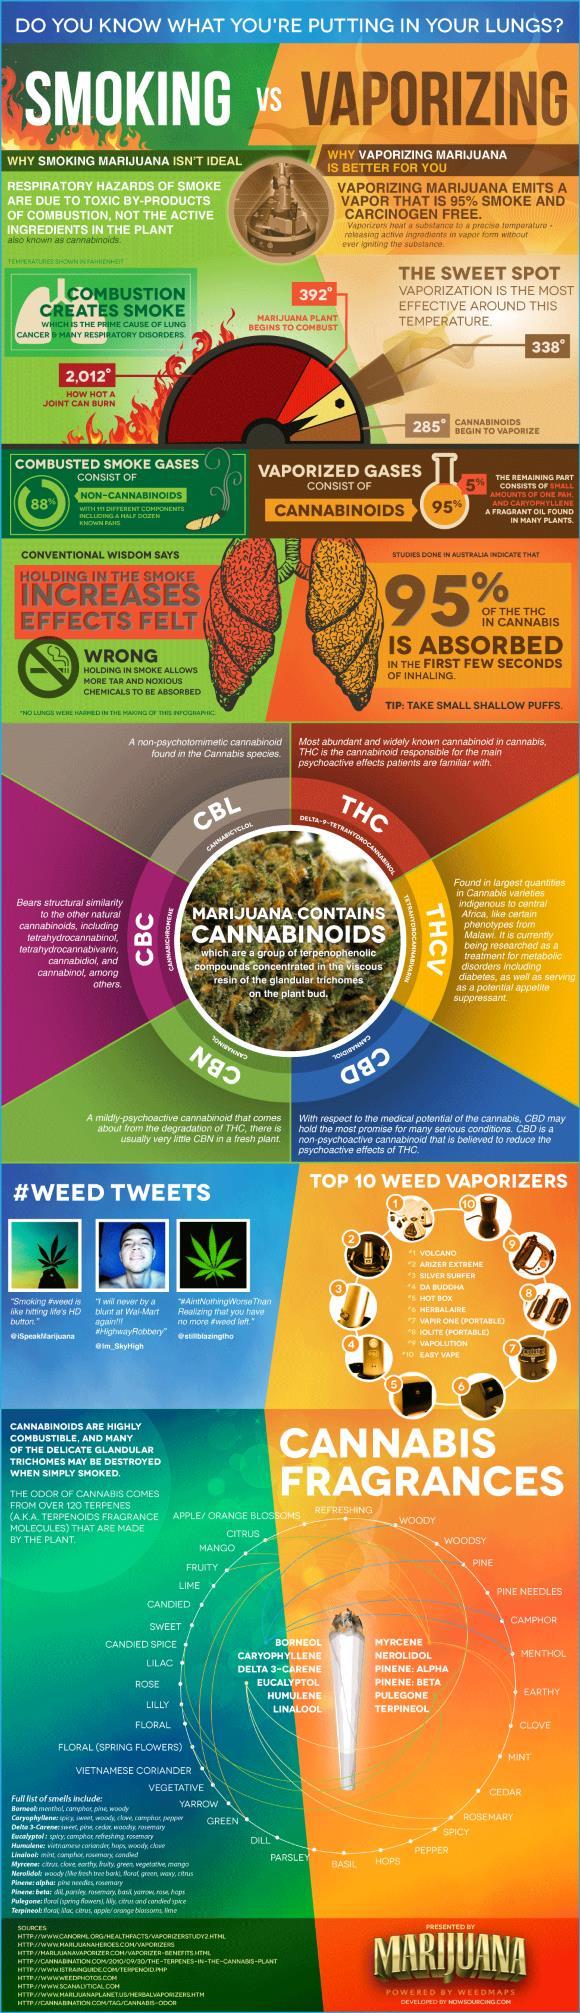 Smoking VS vaporizing Medical Marijuana